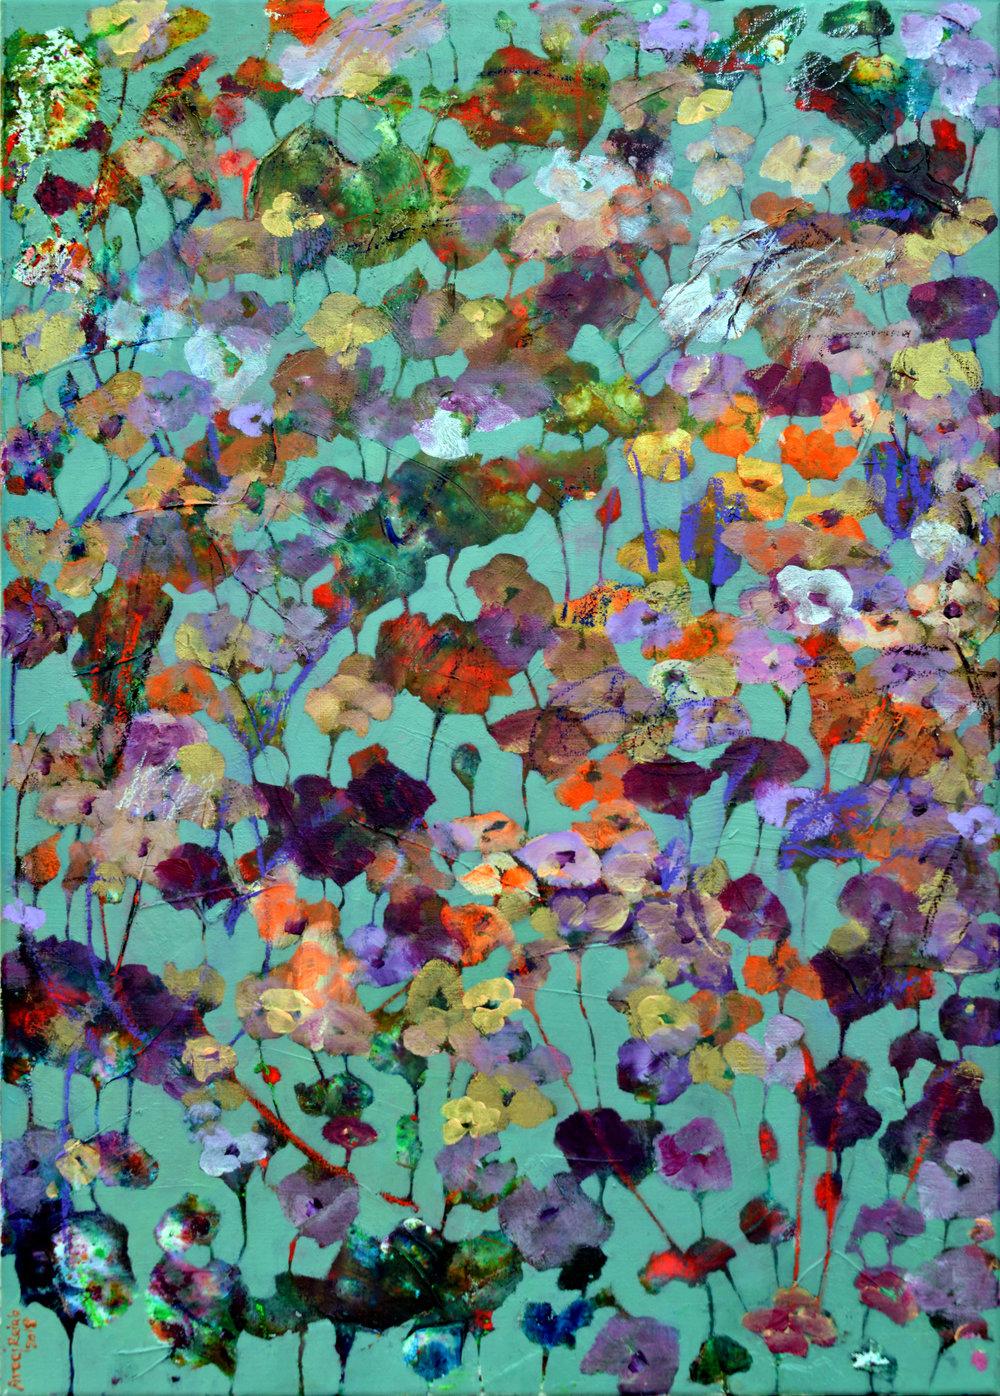 Untitled | Areej Rajab |50x70 cm | Mixed Media on Canvas | BHD400.JPG